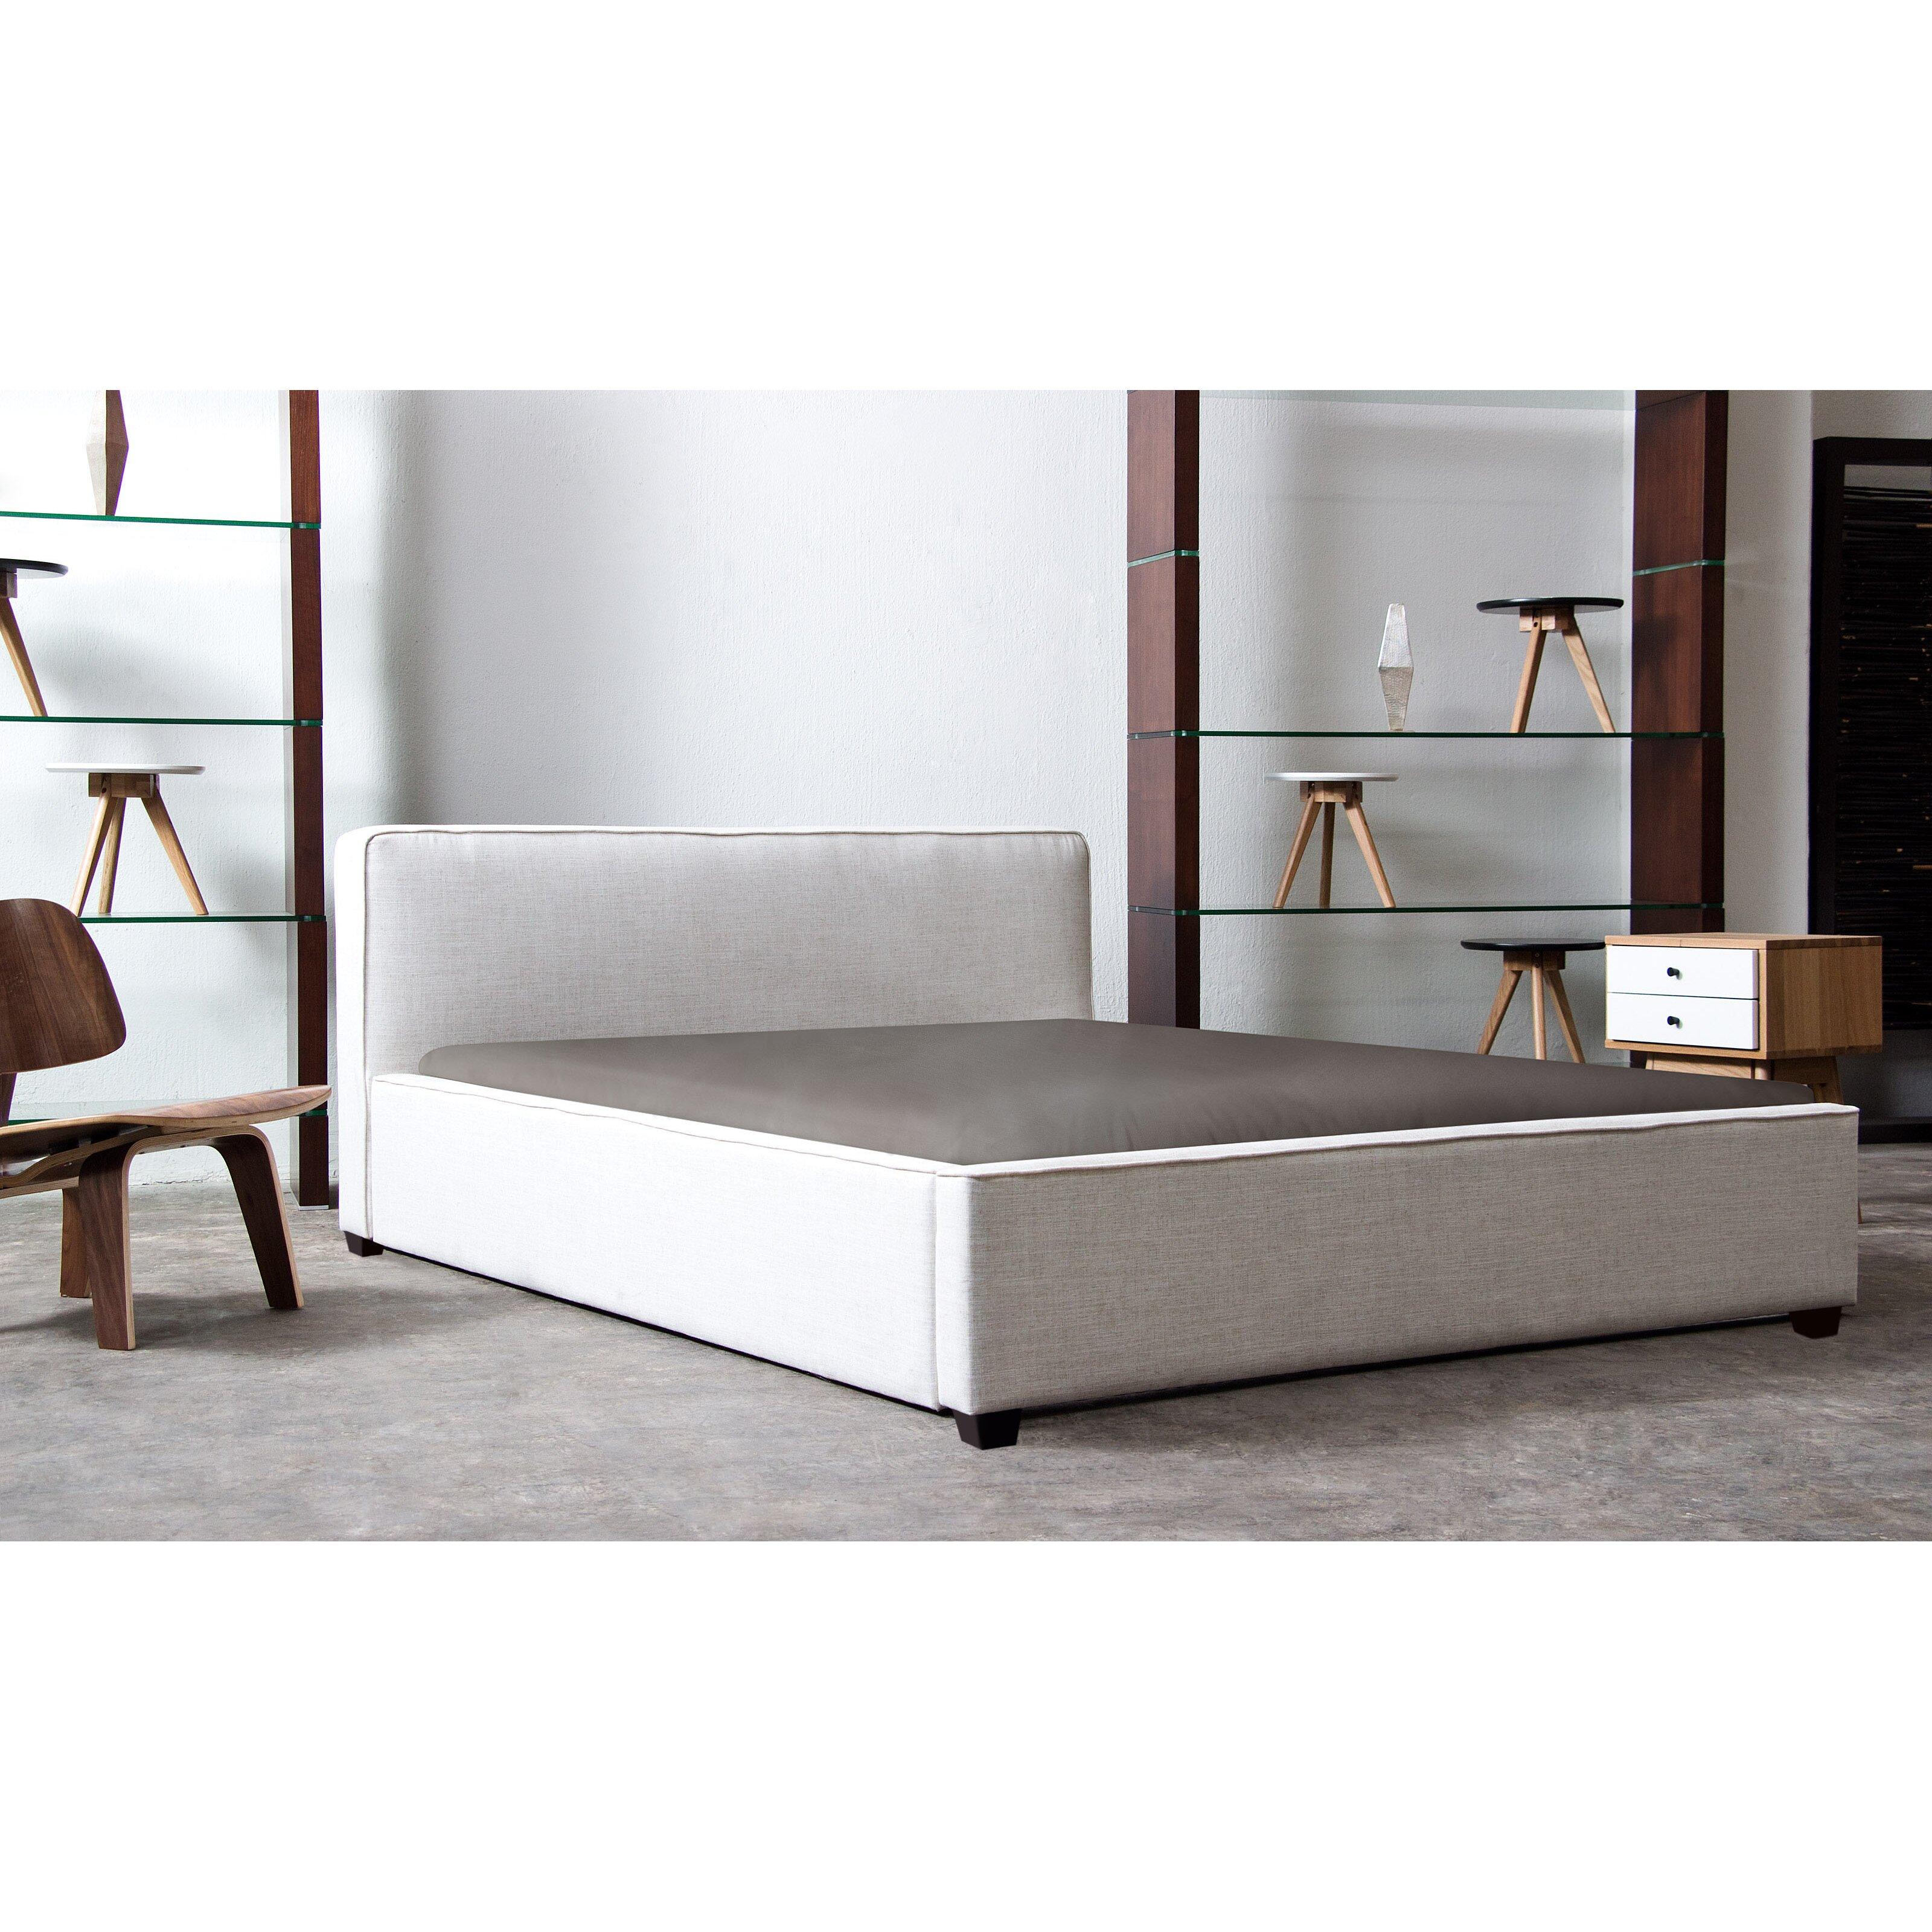 Diamond sofa euro bed frame reviews wayfair for Diamond bed frame